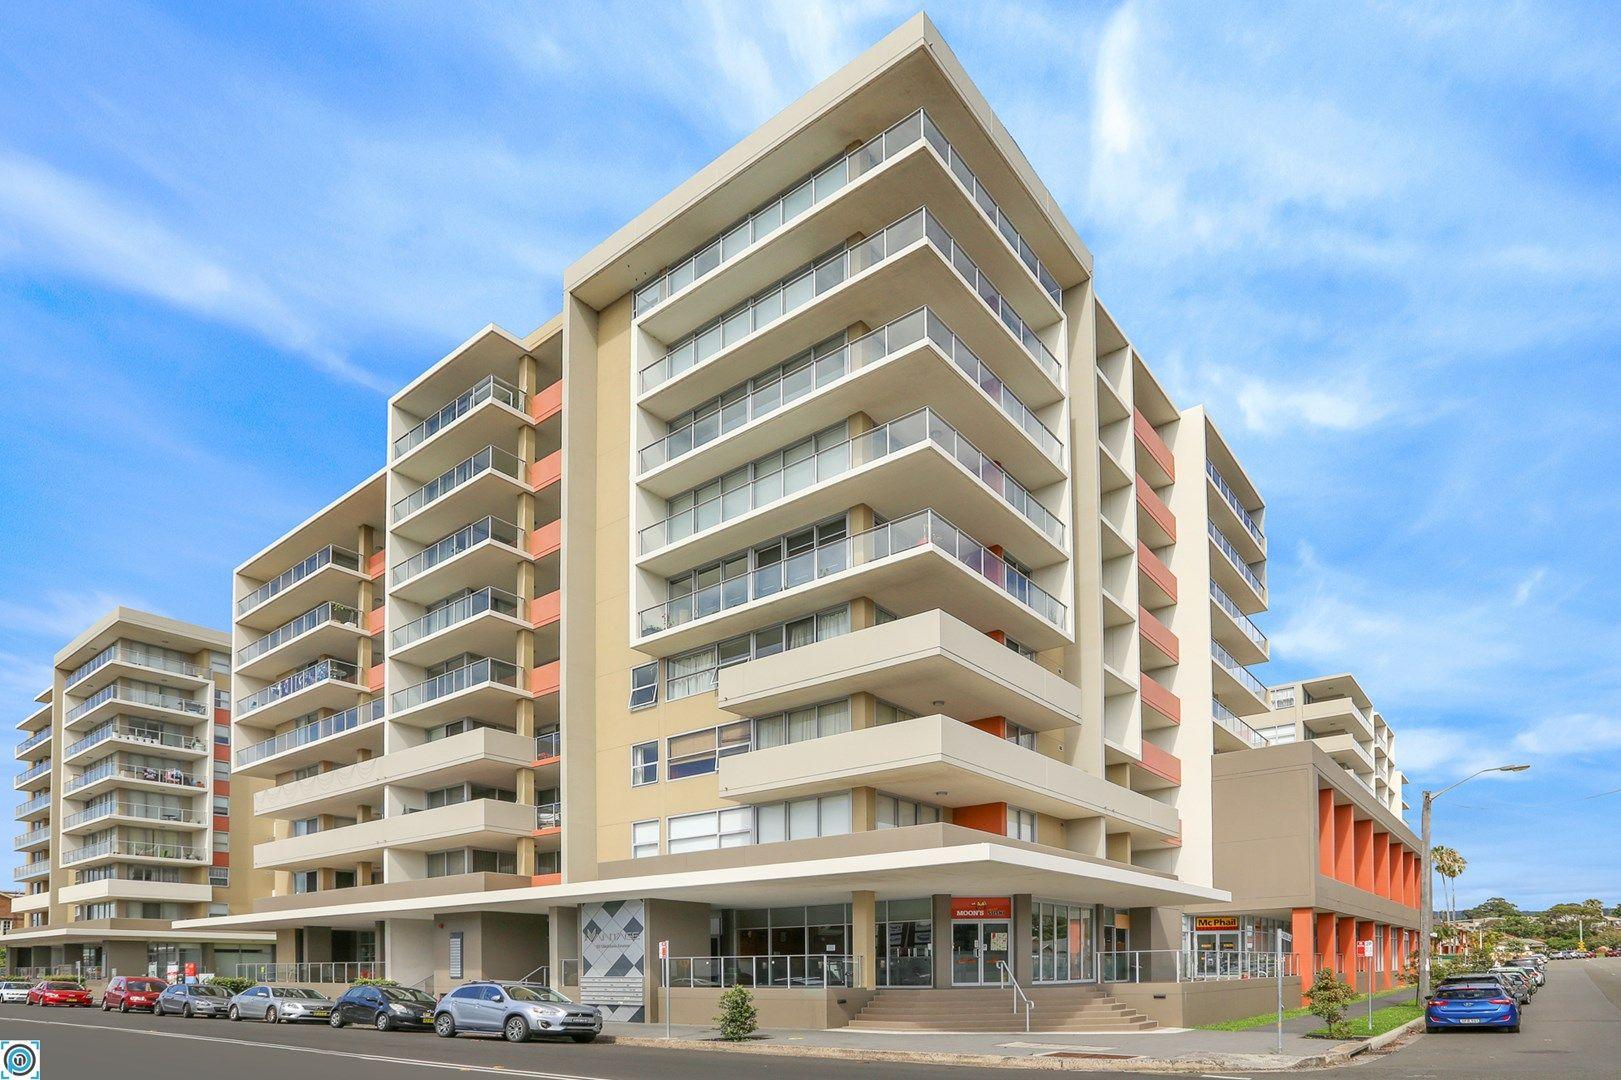 55/22-32 Gladstone Avenue, Wollongong NSW 2500, Image 0